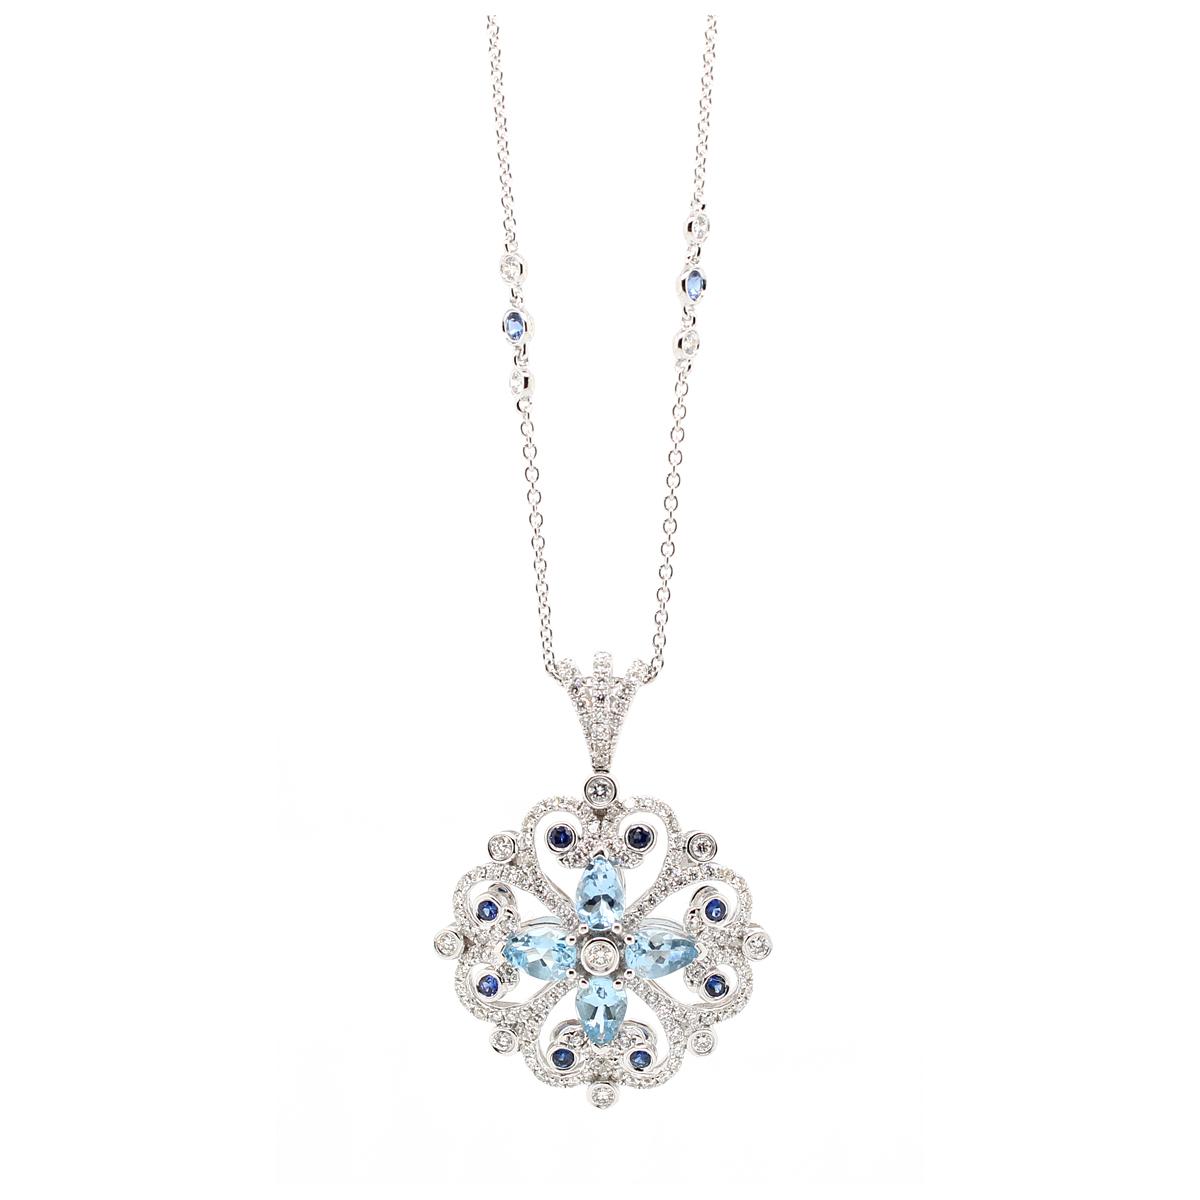 Charles Krypell 18 Karat White Gold Diamond, Aquamarine and Blue Sapphire Pendant Necklace